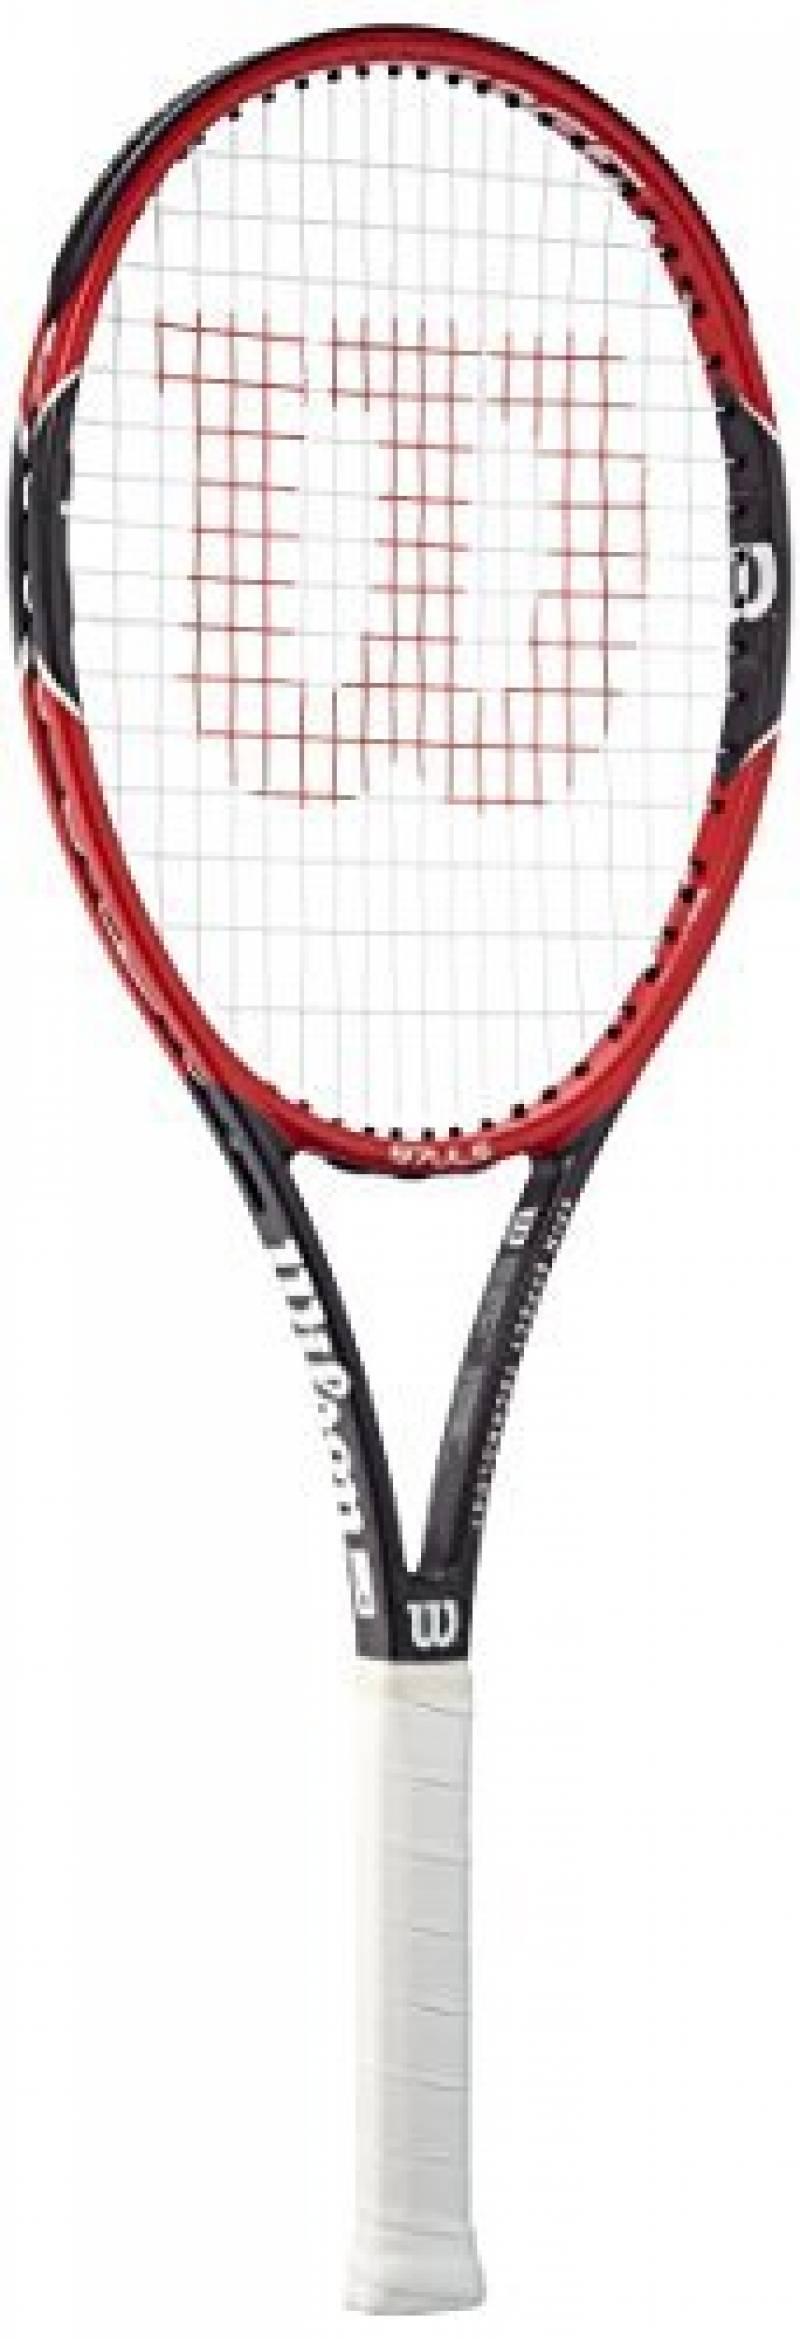 la raquette wilson pro staff meilleur tennis. Black Bedroom Furniture Sets. Home Design Ideas